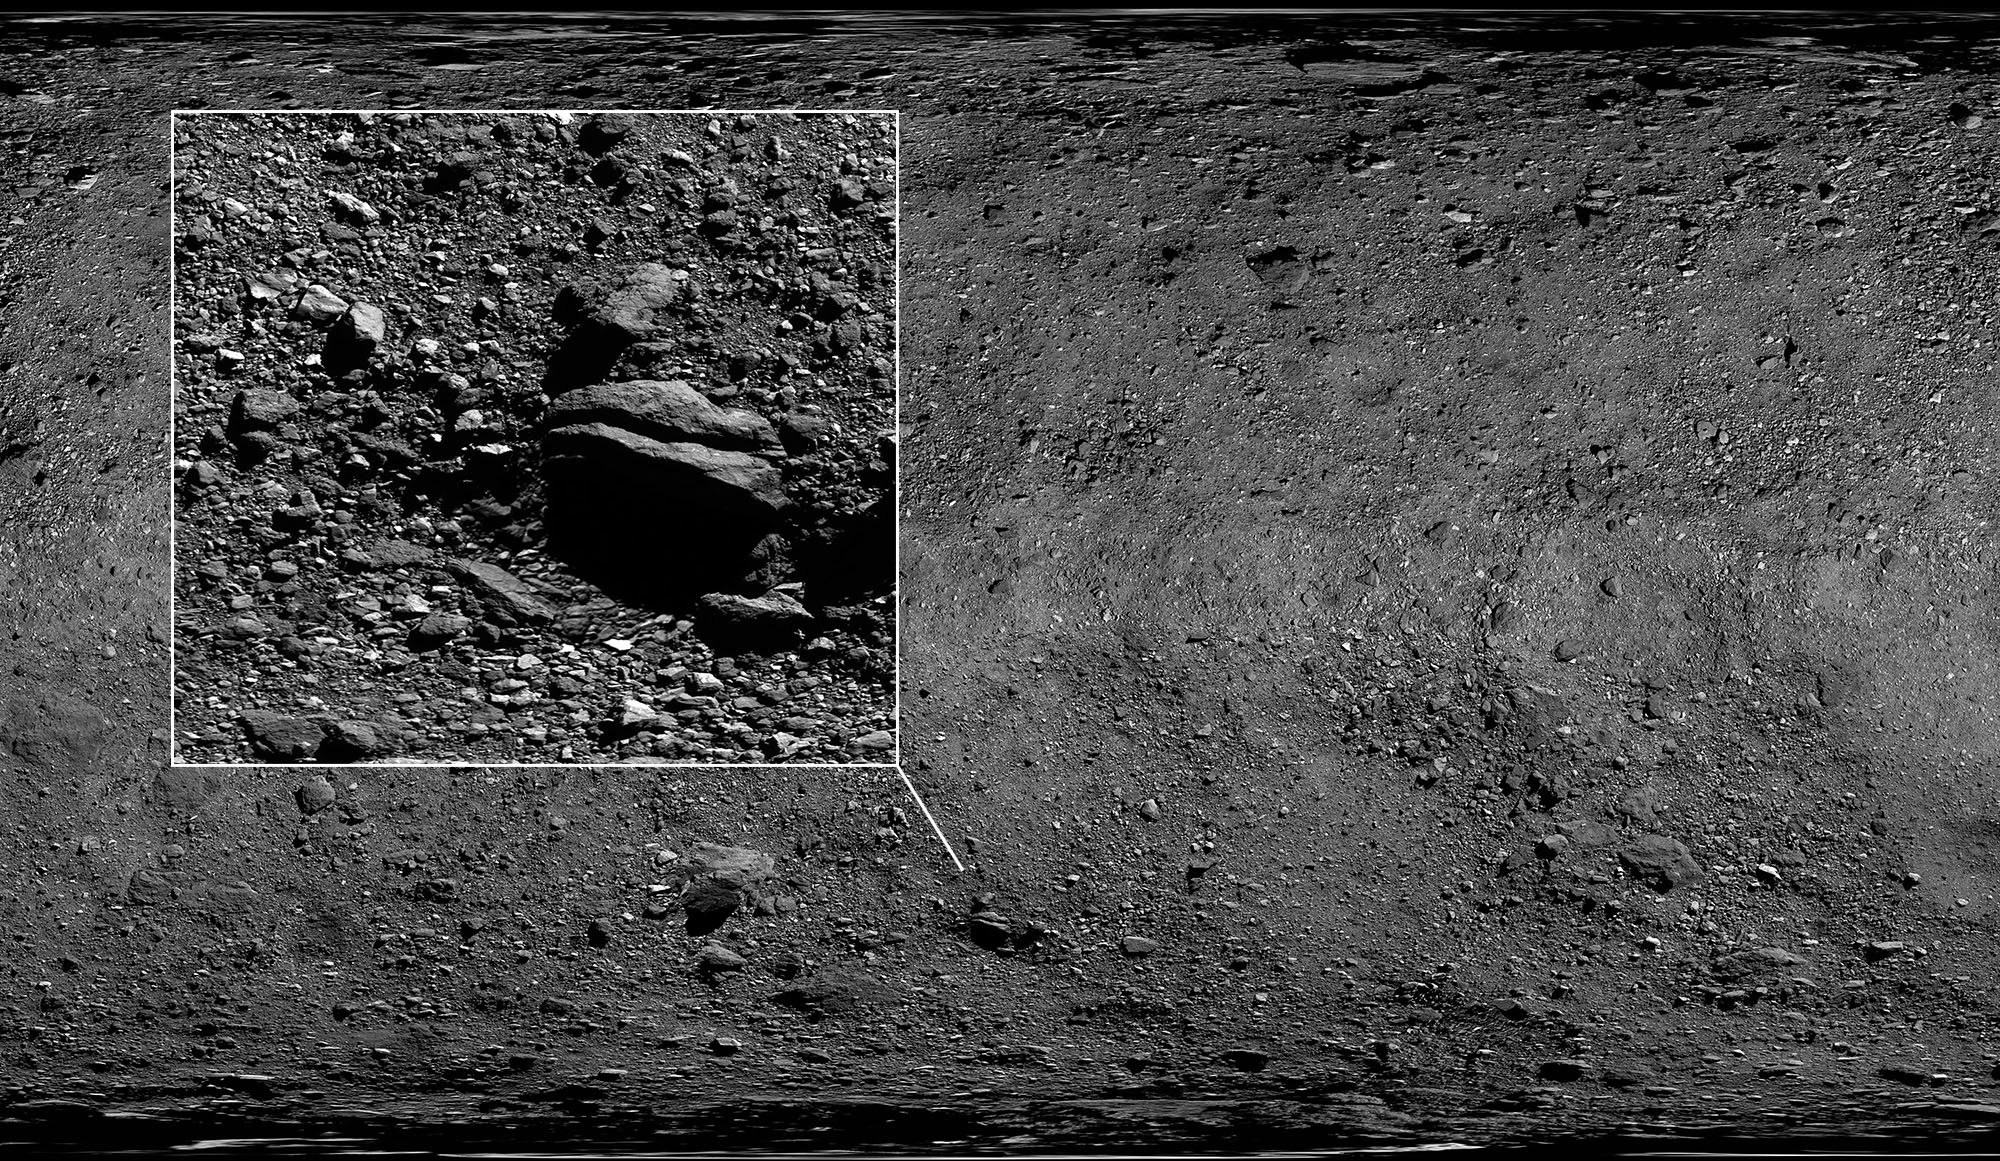 Asteroid Bennu mosaic detail